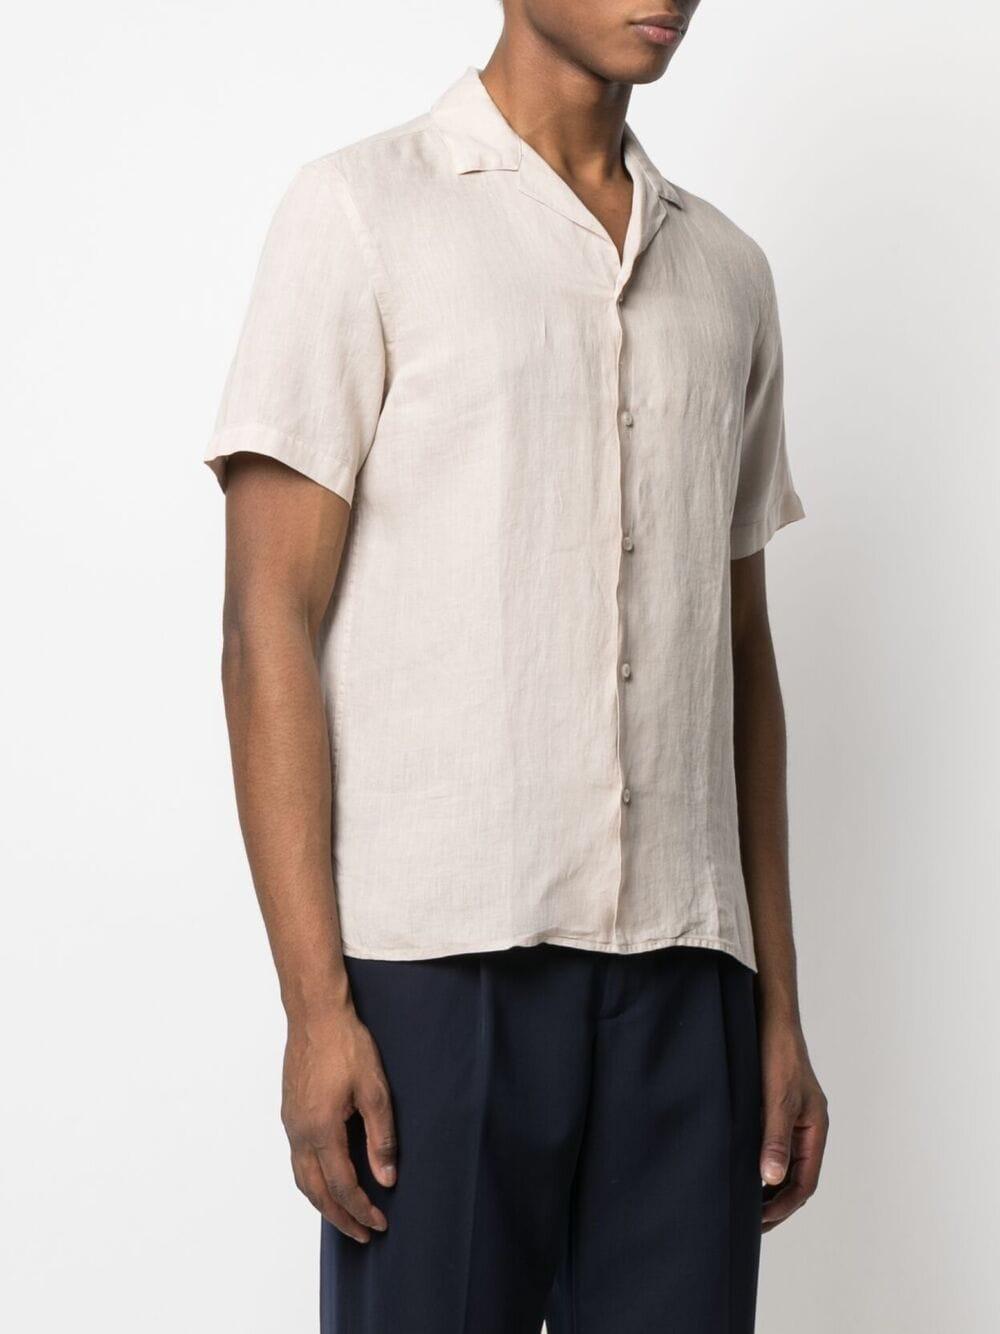 Beige linen spread-collar shirt  ALTEA |  | 215400331